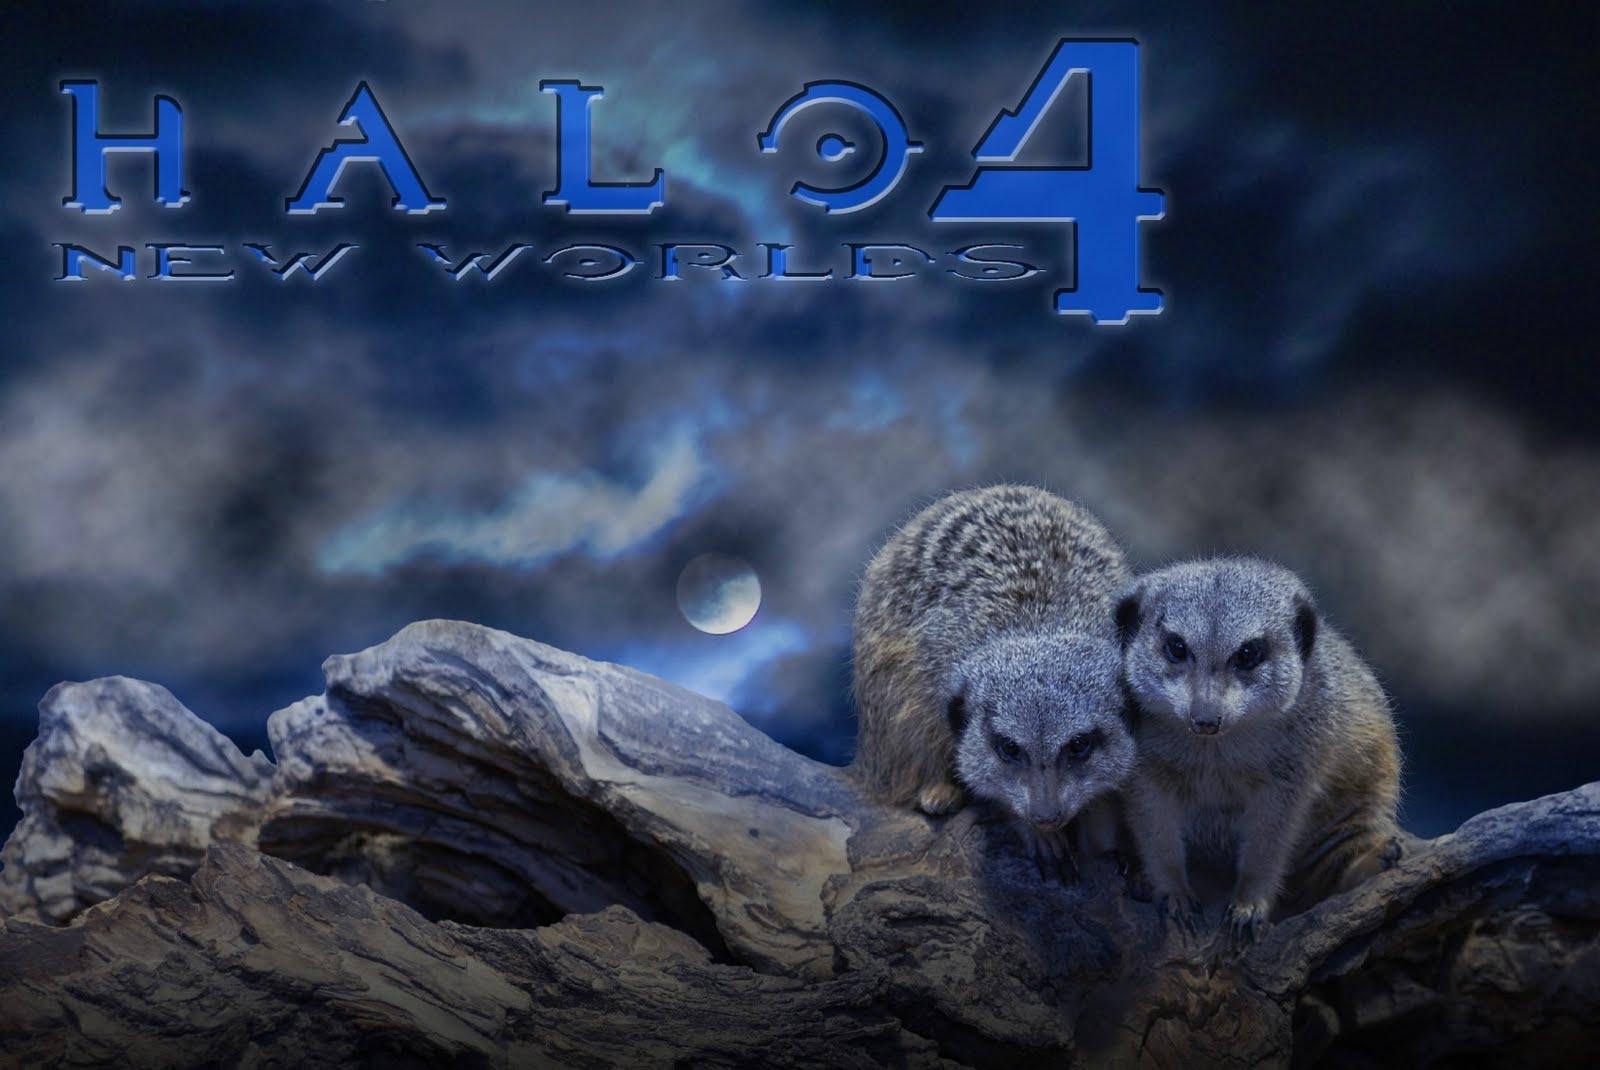 Halo 4 HD Wallpapers New Worlds Desktop Wallpapers 1600x1070